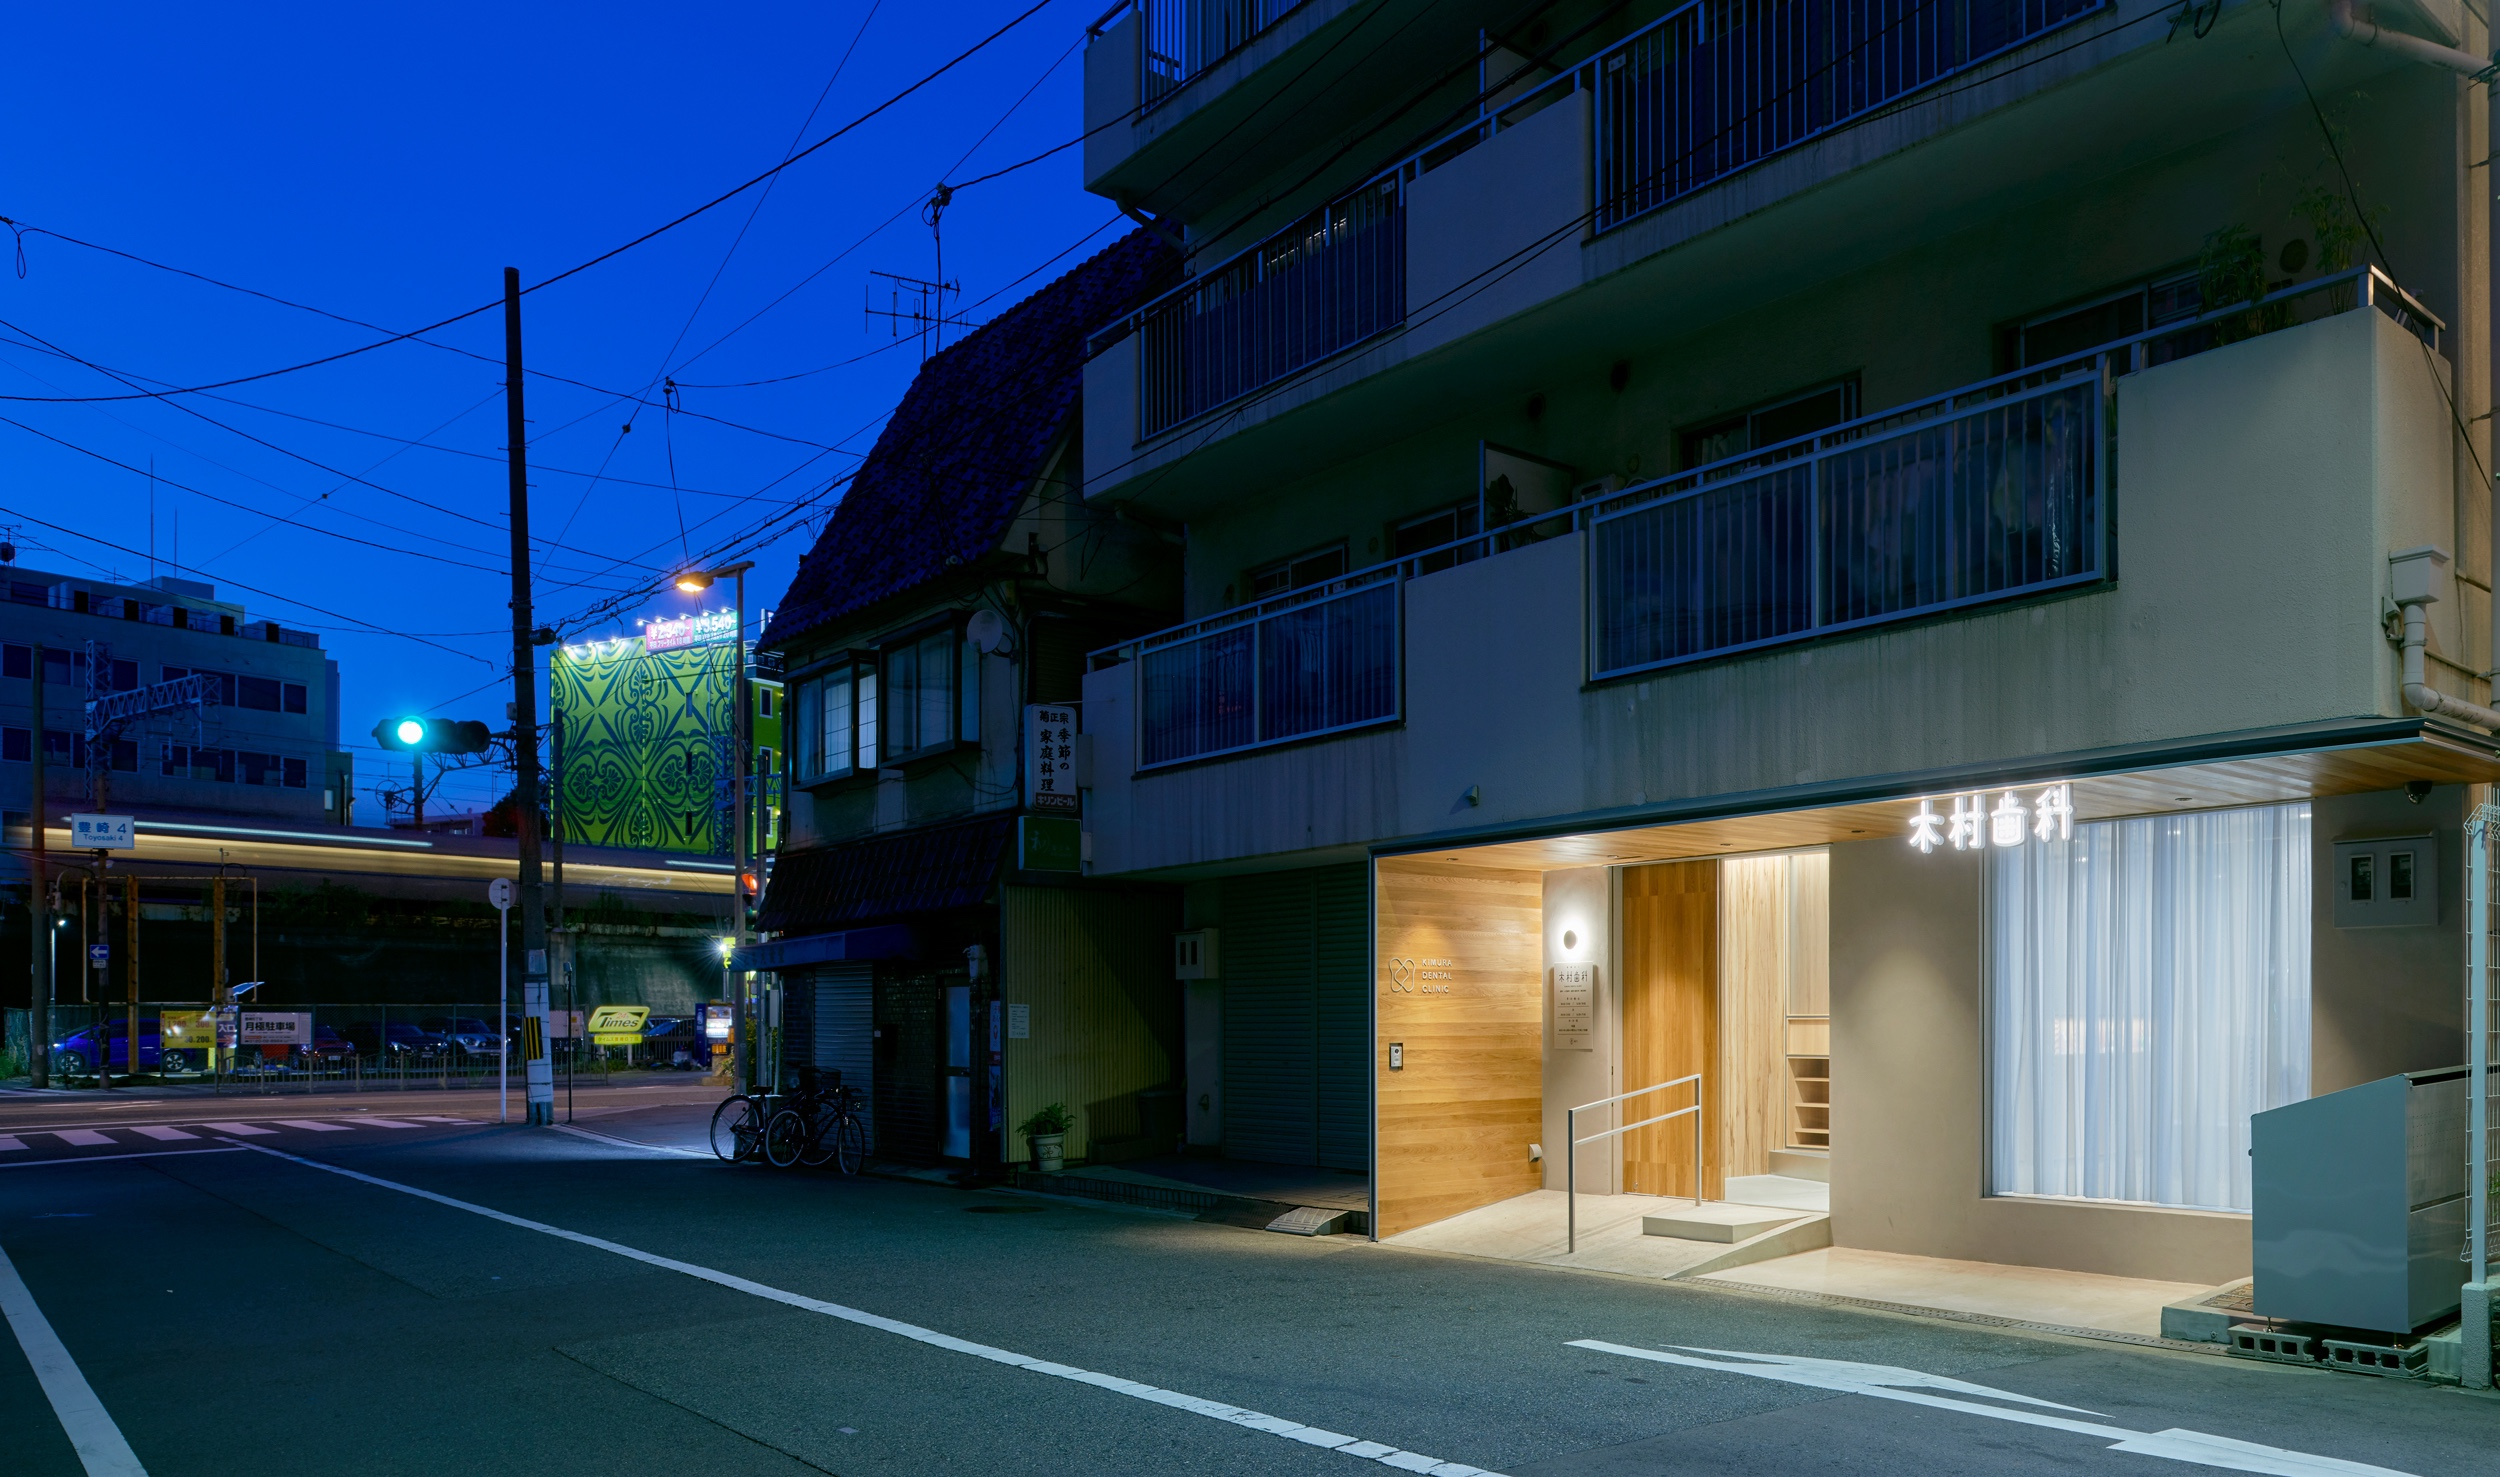 Kimura Dental Clinic 08s ©Takeshi Asano 2019